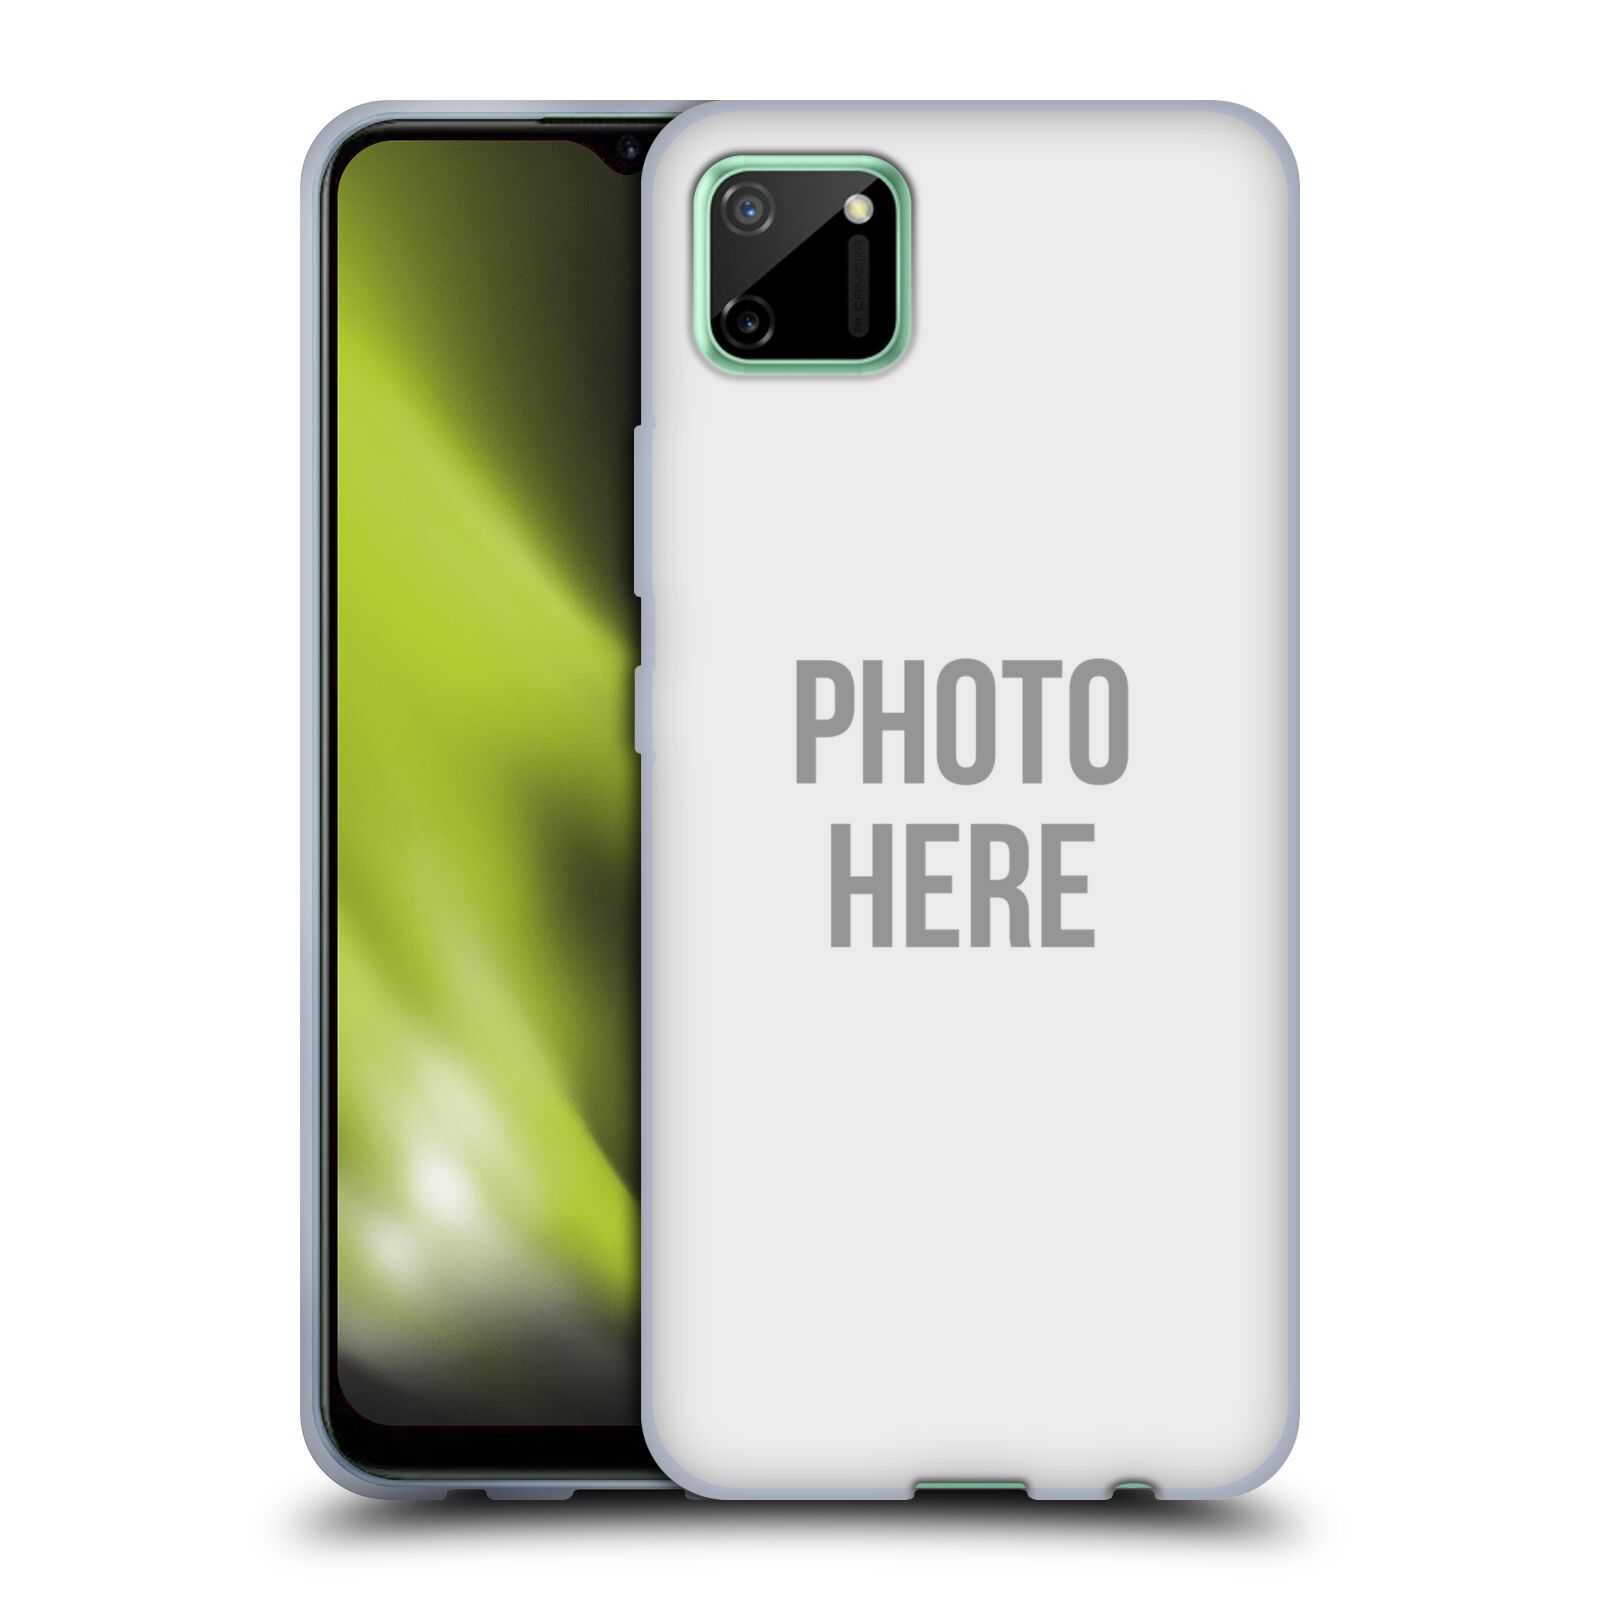 Silikonové pouzdro na mobil Realme C11 s vlastním motivem